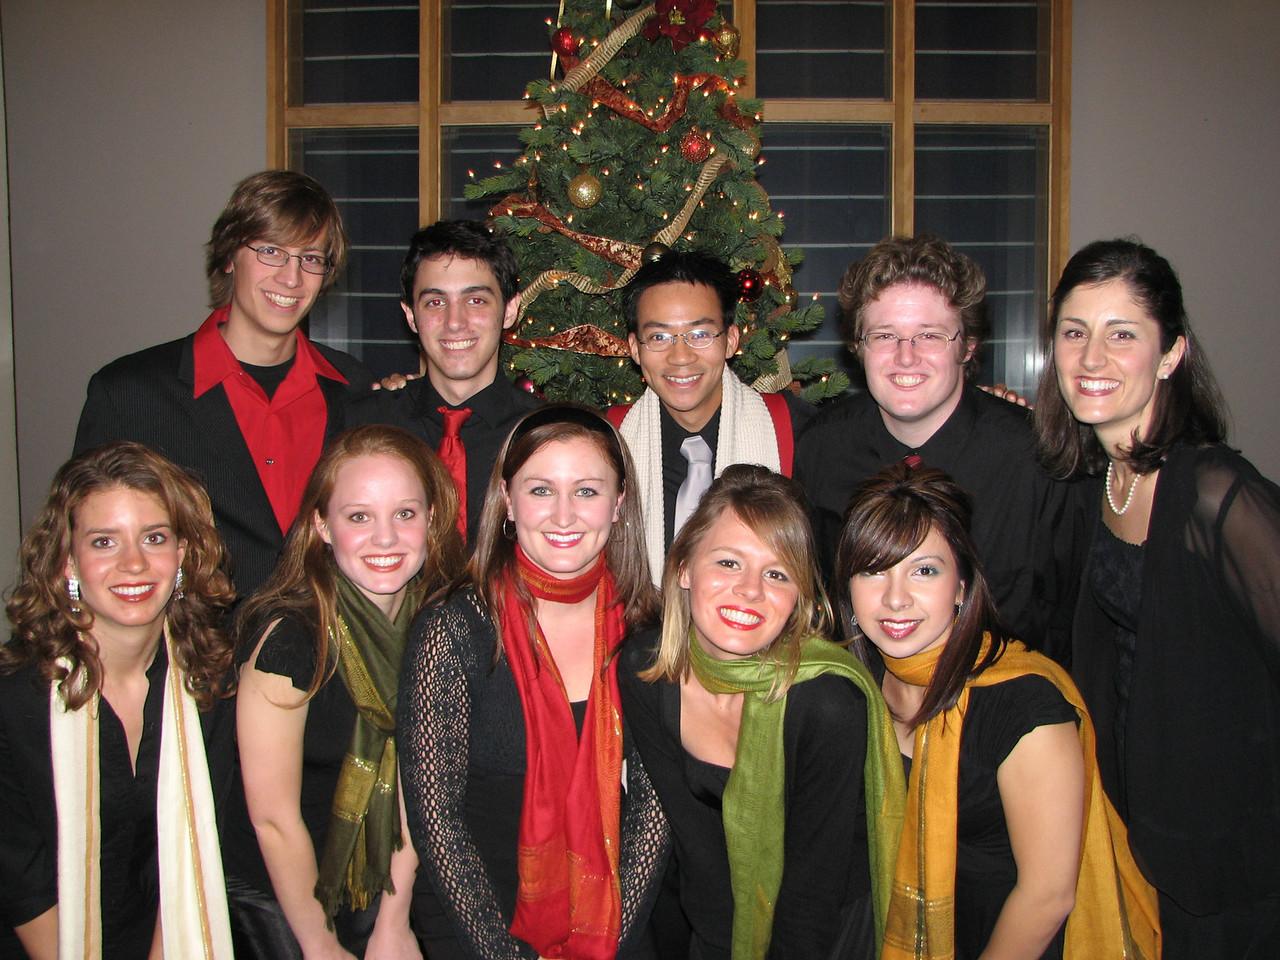 2006 12 09 Sat - Biola Vocal Jazz Ensemble 2 - Dan Rigall, Trevor Gomes, Ben Yu, Jordan Johnson, Shawna Stewart, Laura Coghlan, Heather Onken, Heidi Bargen, Charissa Noble, & Jessi Vasquez